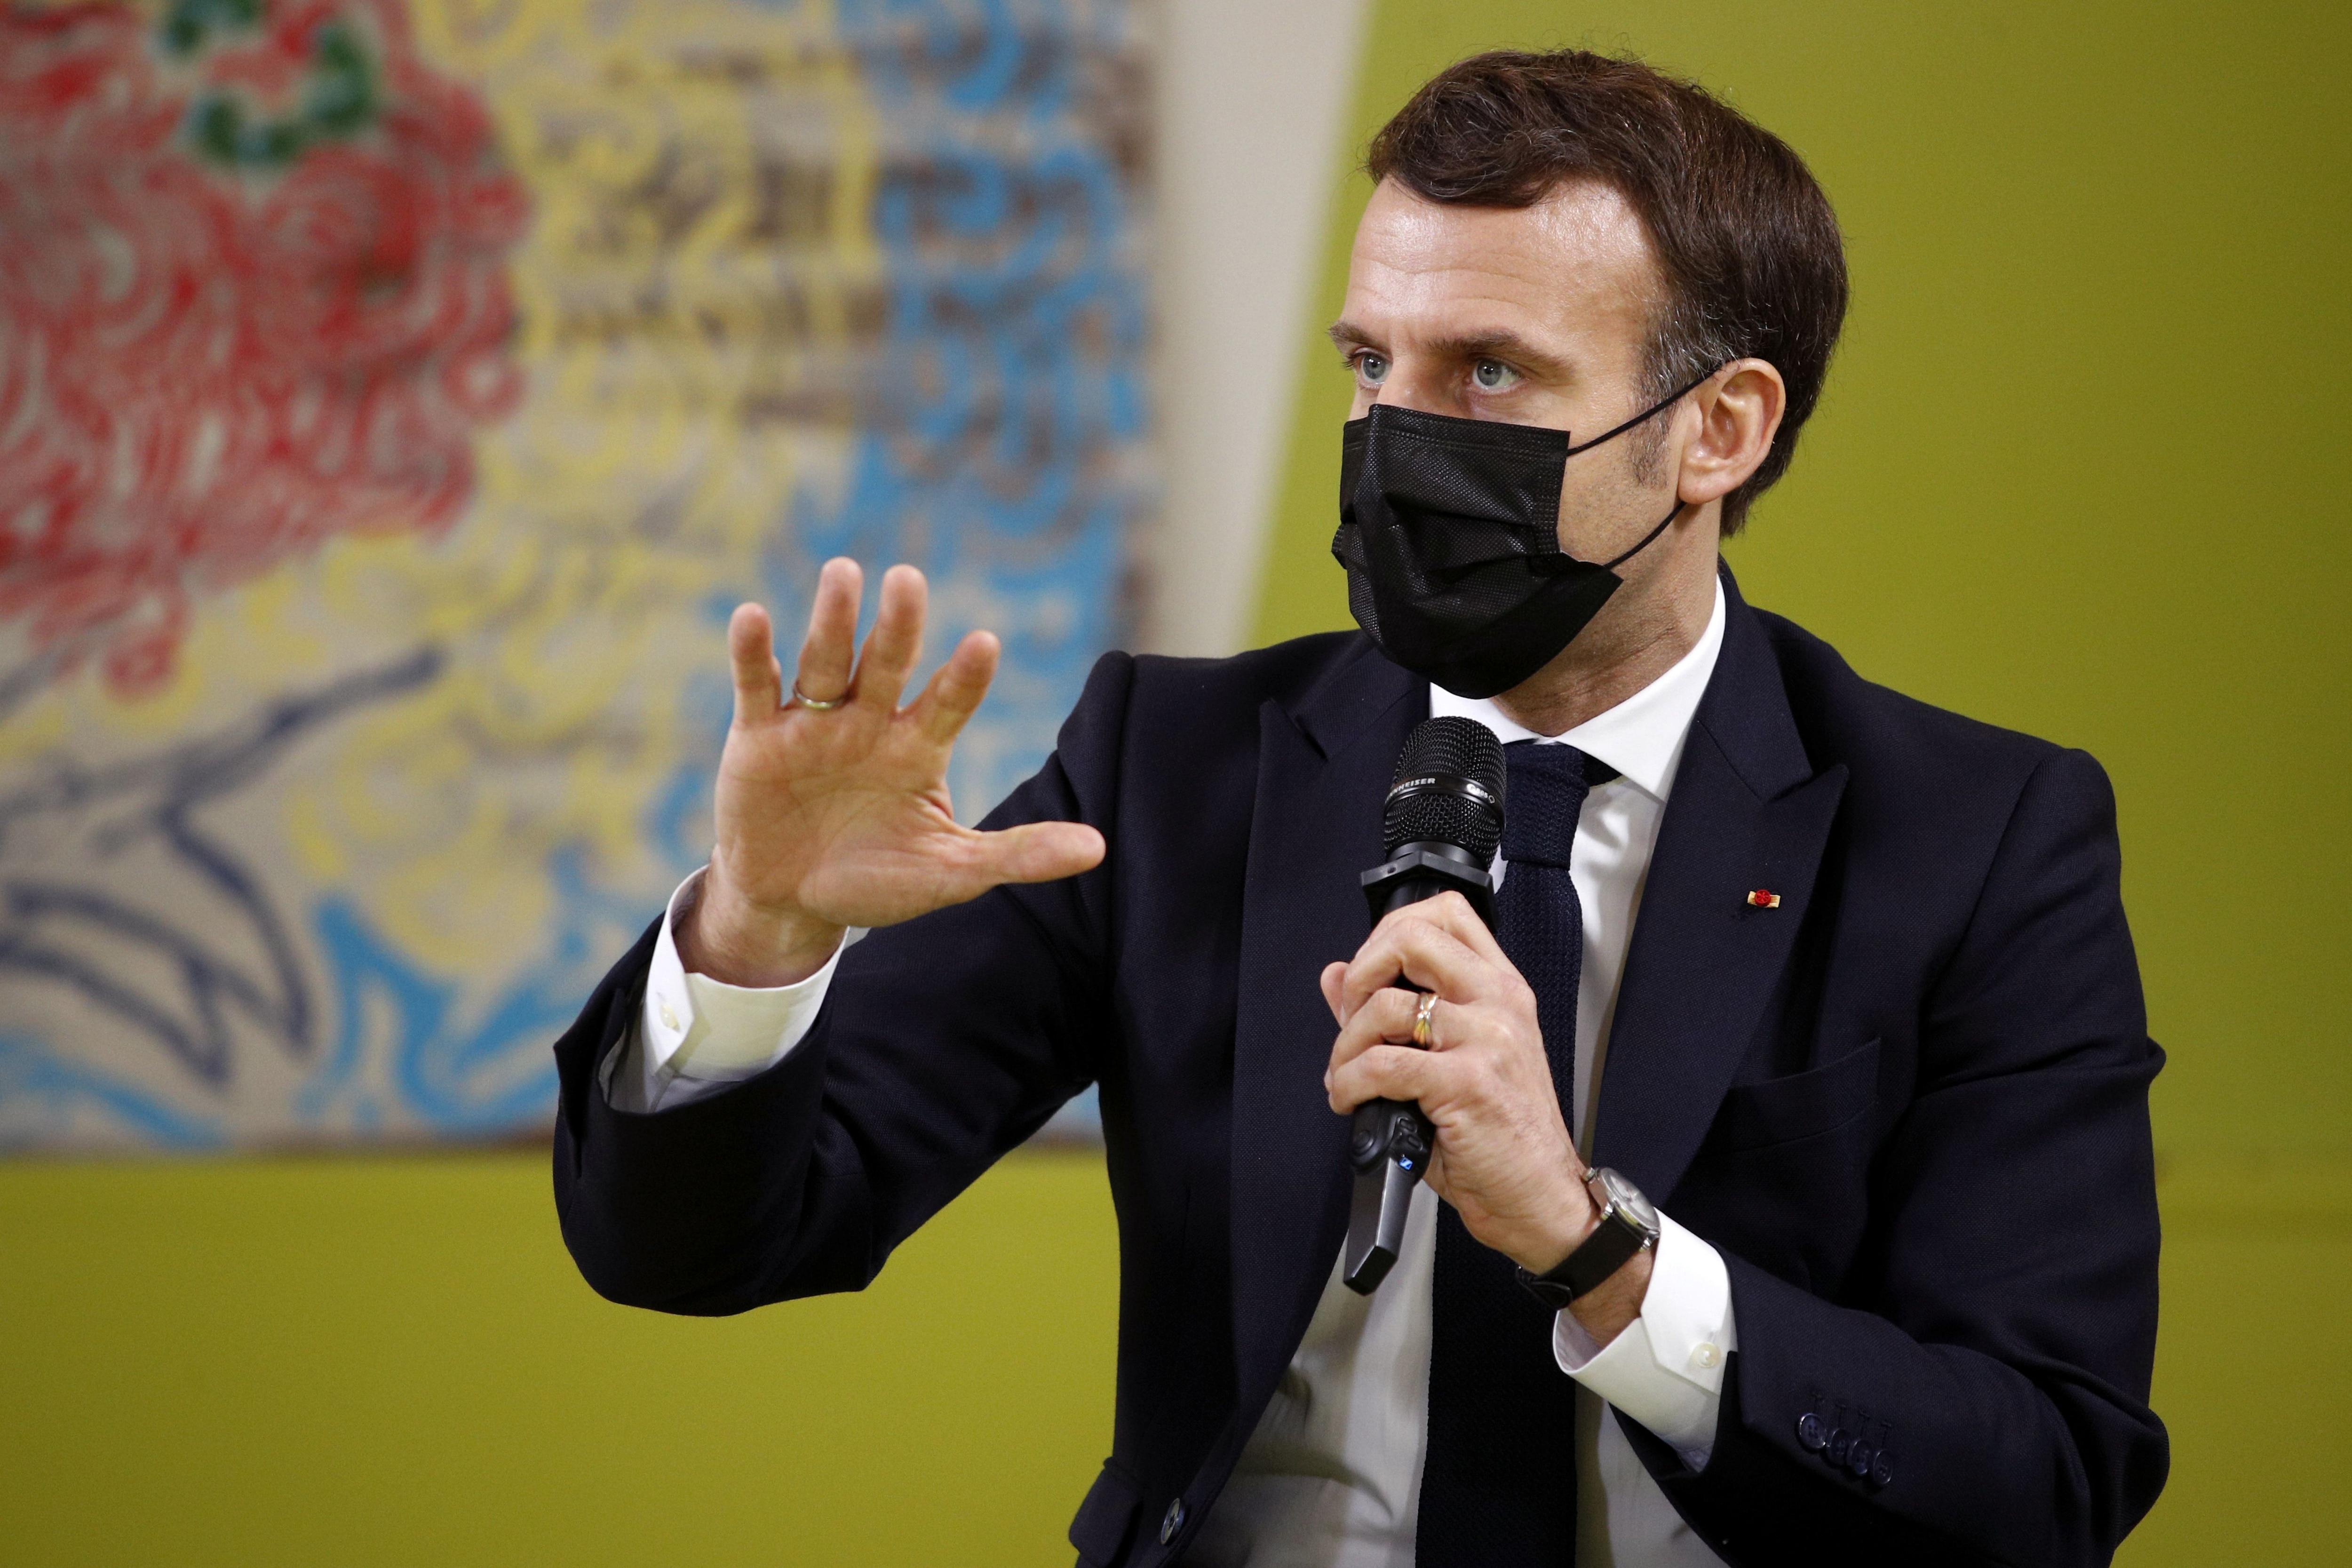 El presidente de Francia, Emmanuel Macron (Yoan Valat/Pool via REUTERS)